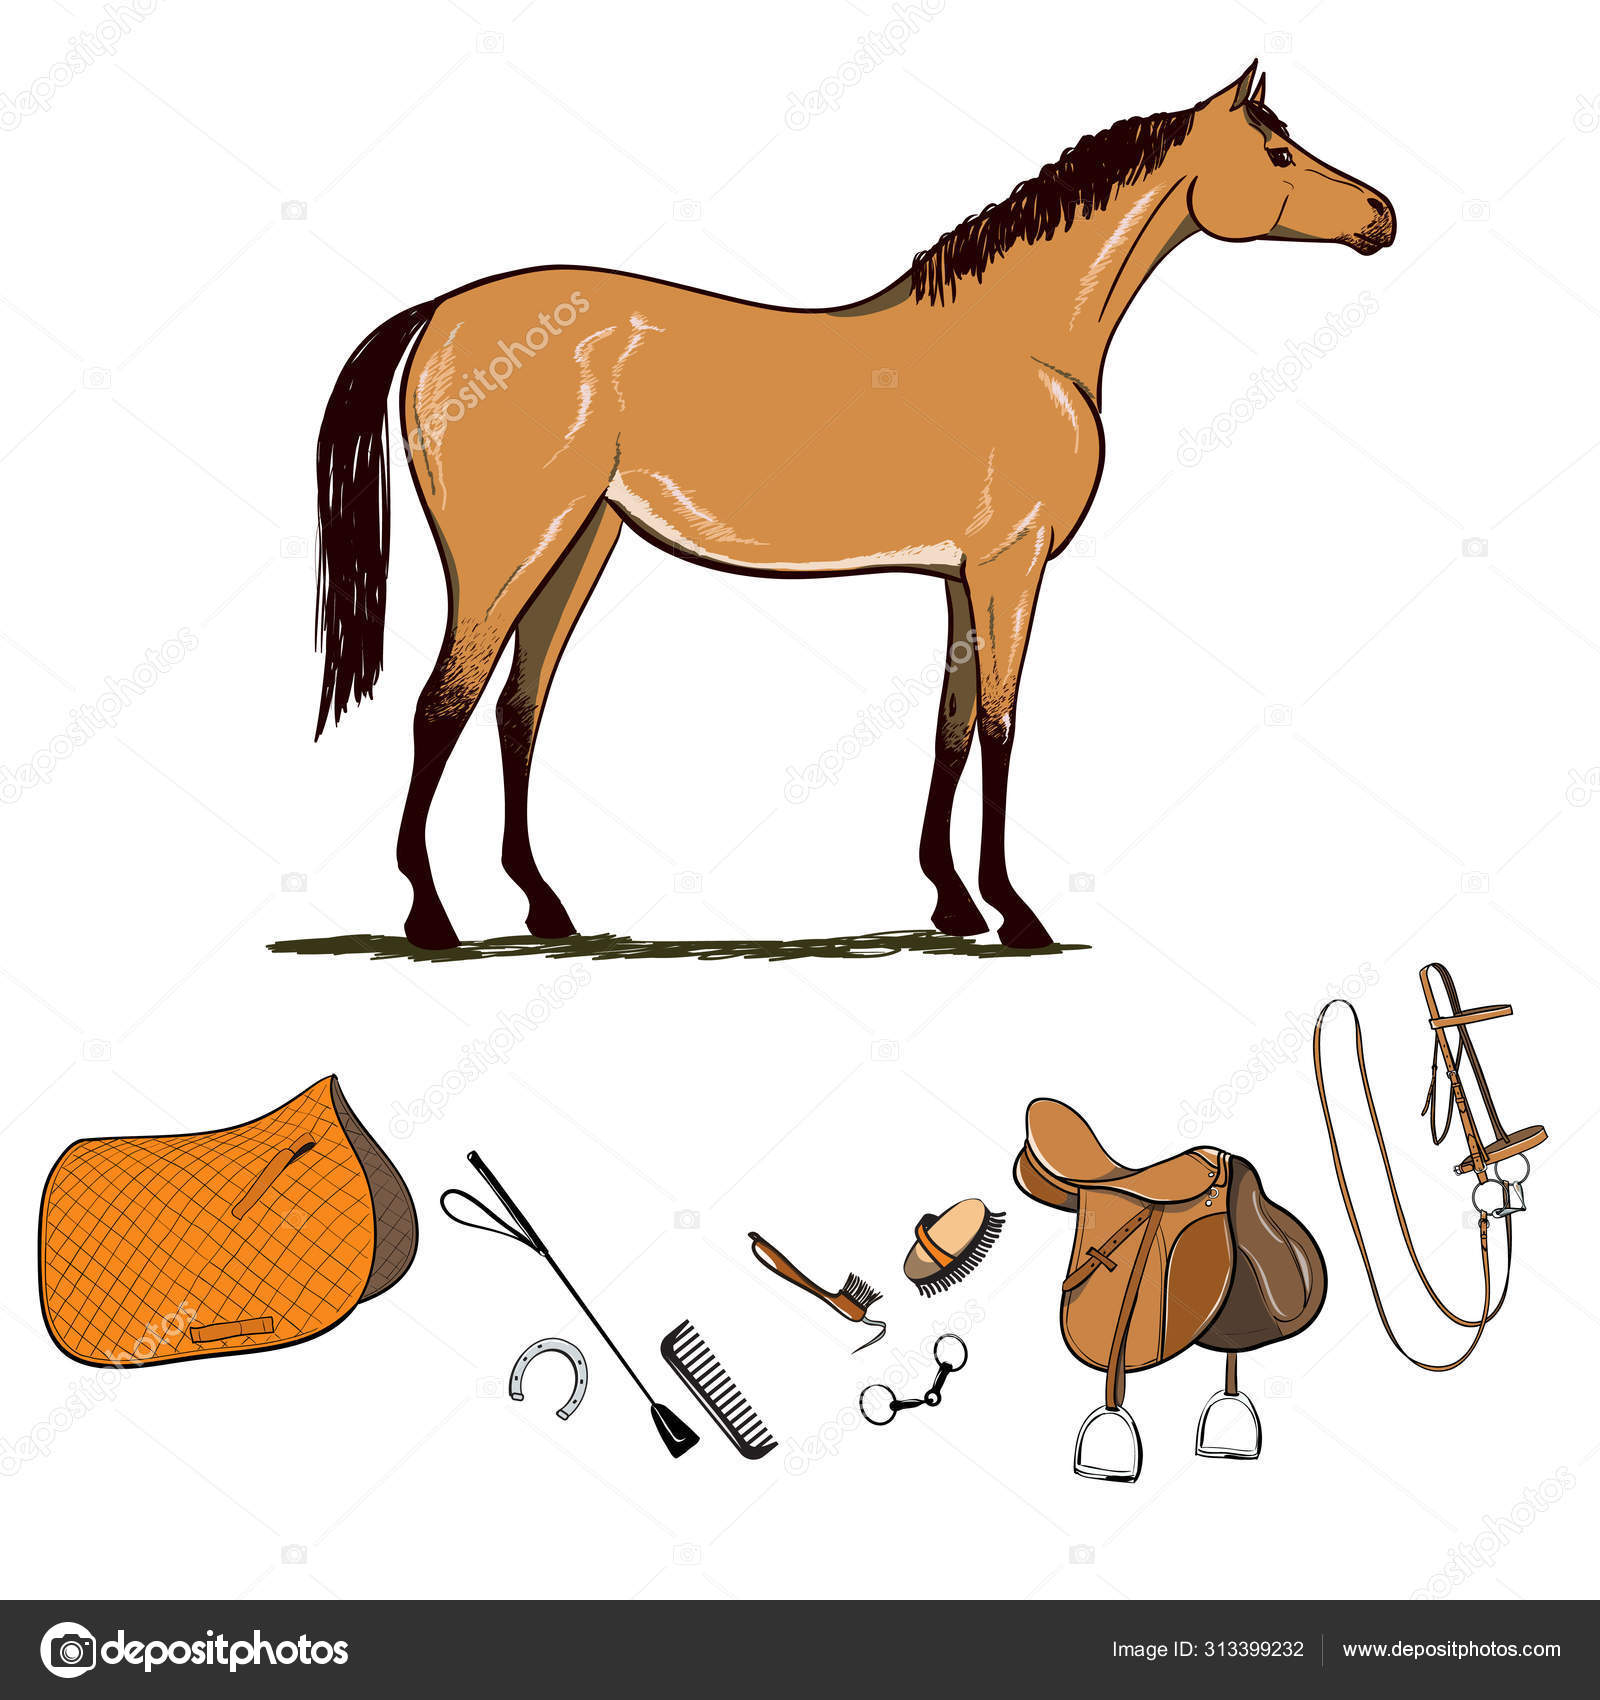 Horse Riding Gear Tools Set Bridle Saddle Stirrup Brush Bit Stock Vector C Larisa Zorina 313399232